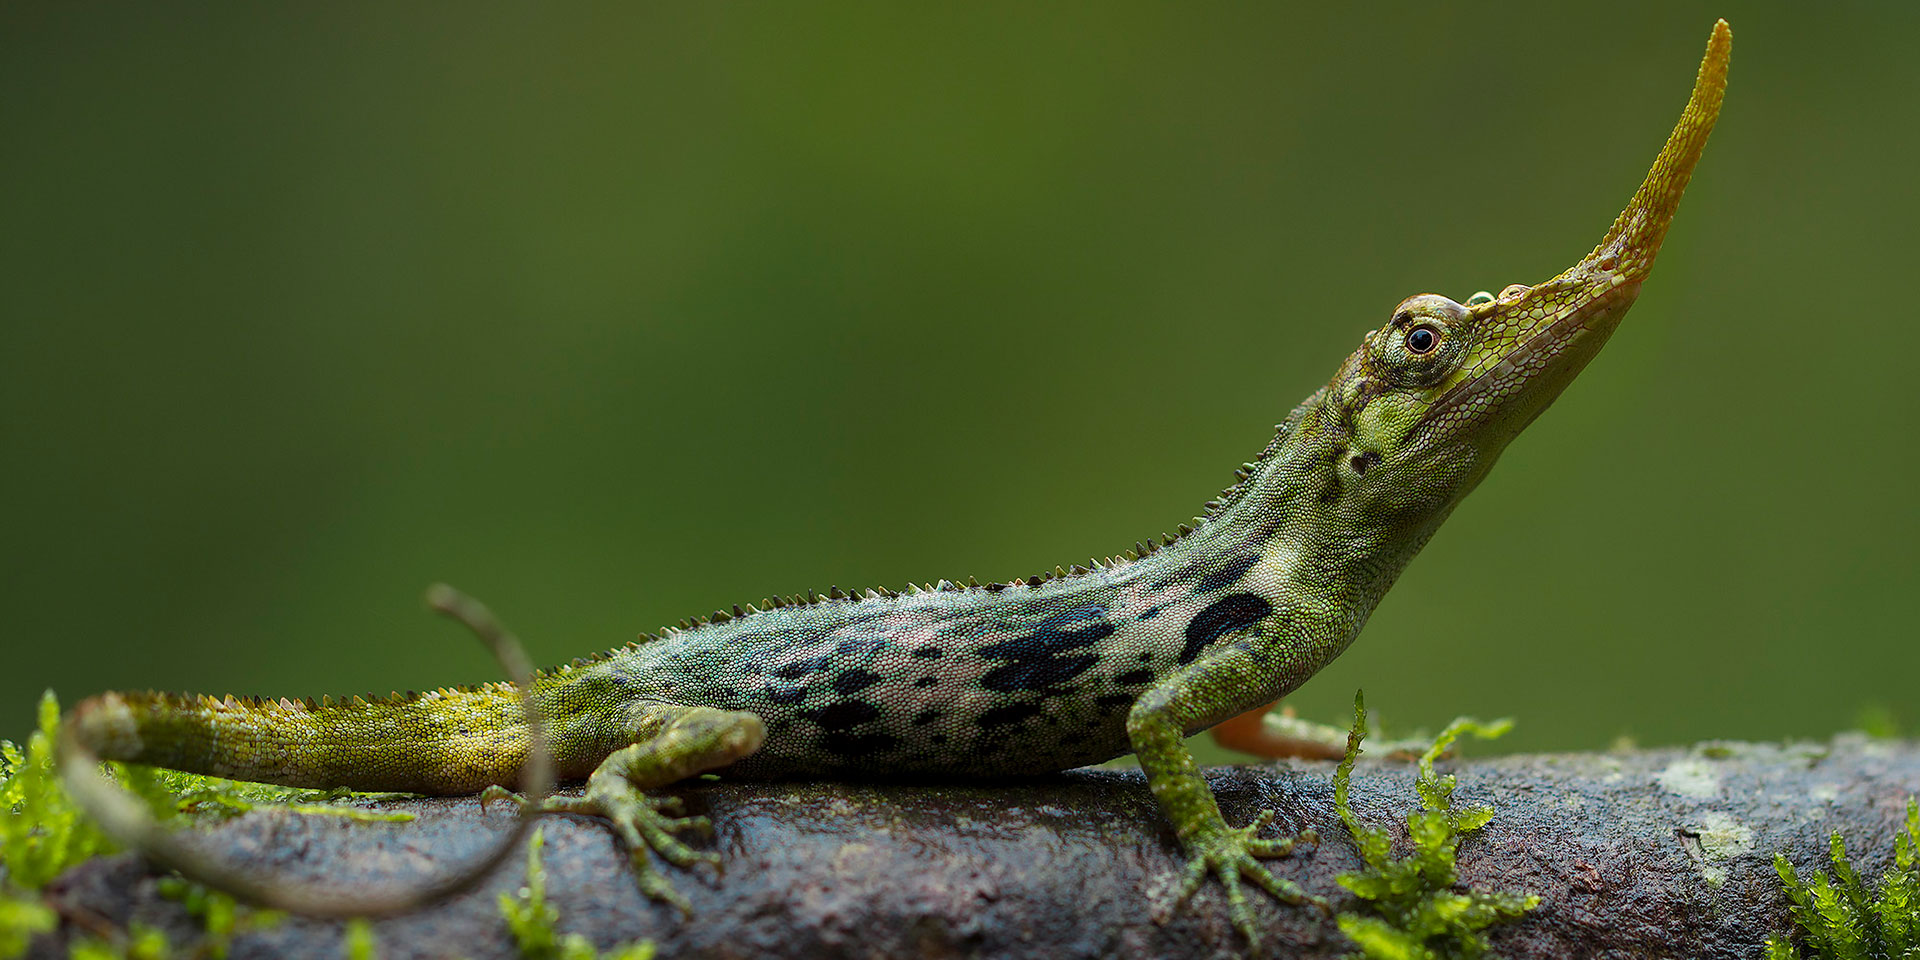 Neoselva-Anolis-proboscis-Ecuador-Portrait-Herping-Website